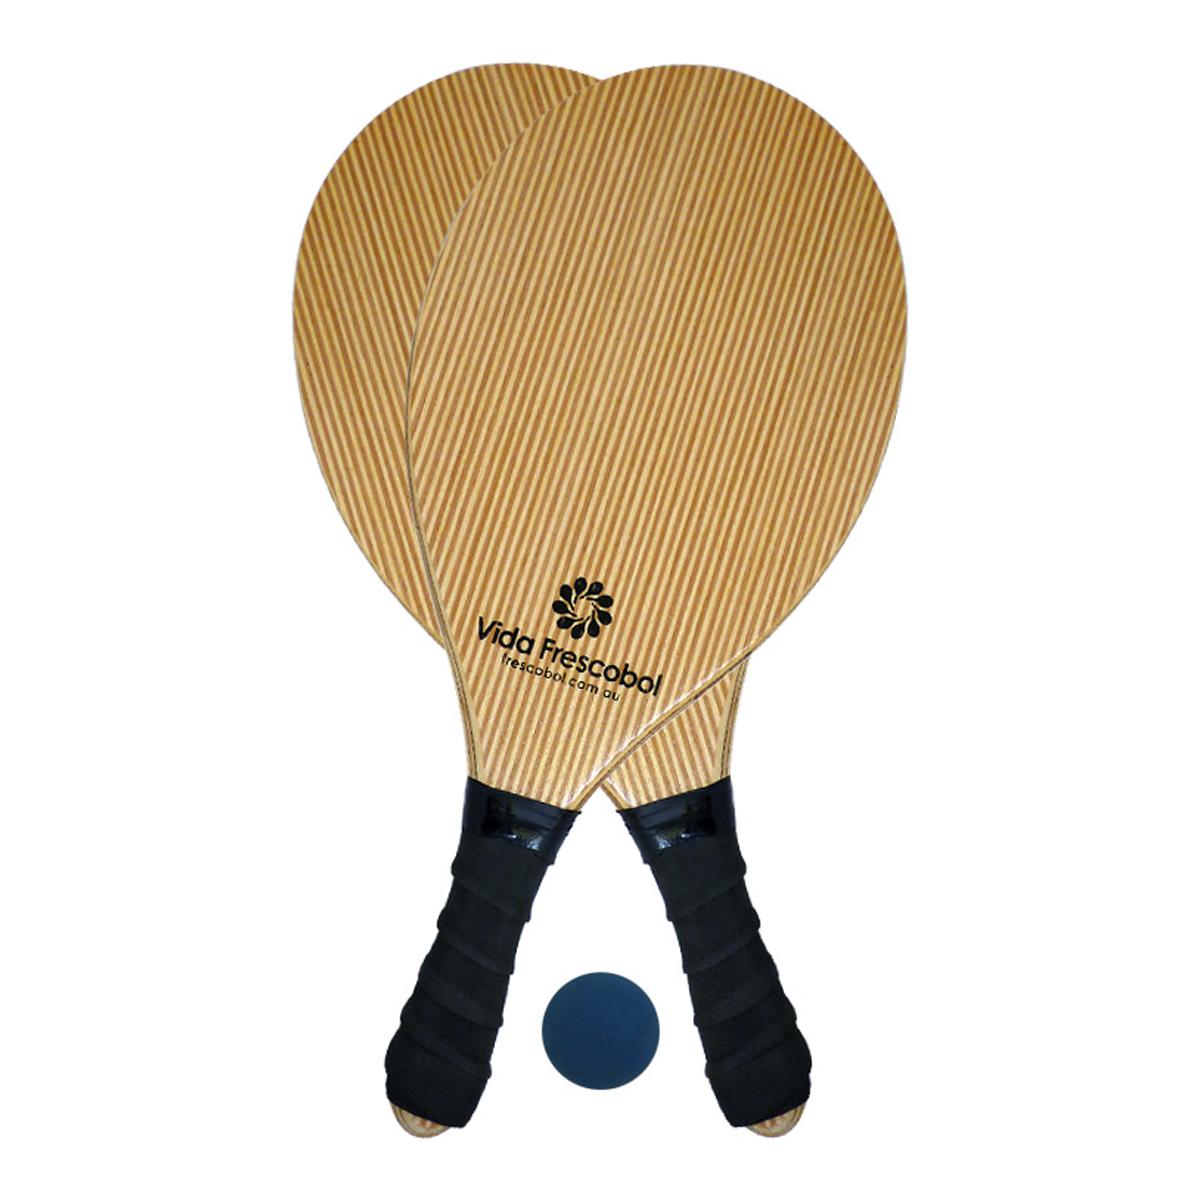 Vida Frescobol Blond Pin Stripe Beach Paddleball Racquet Set